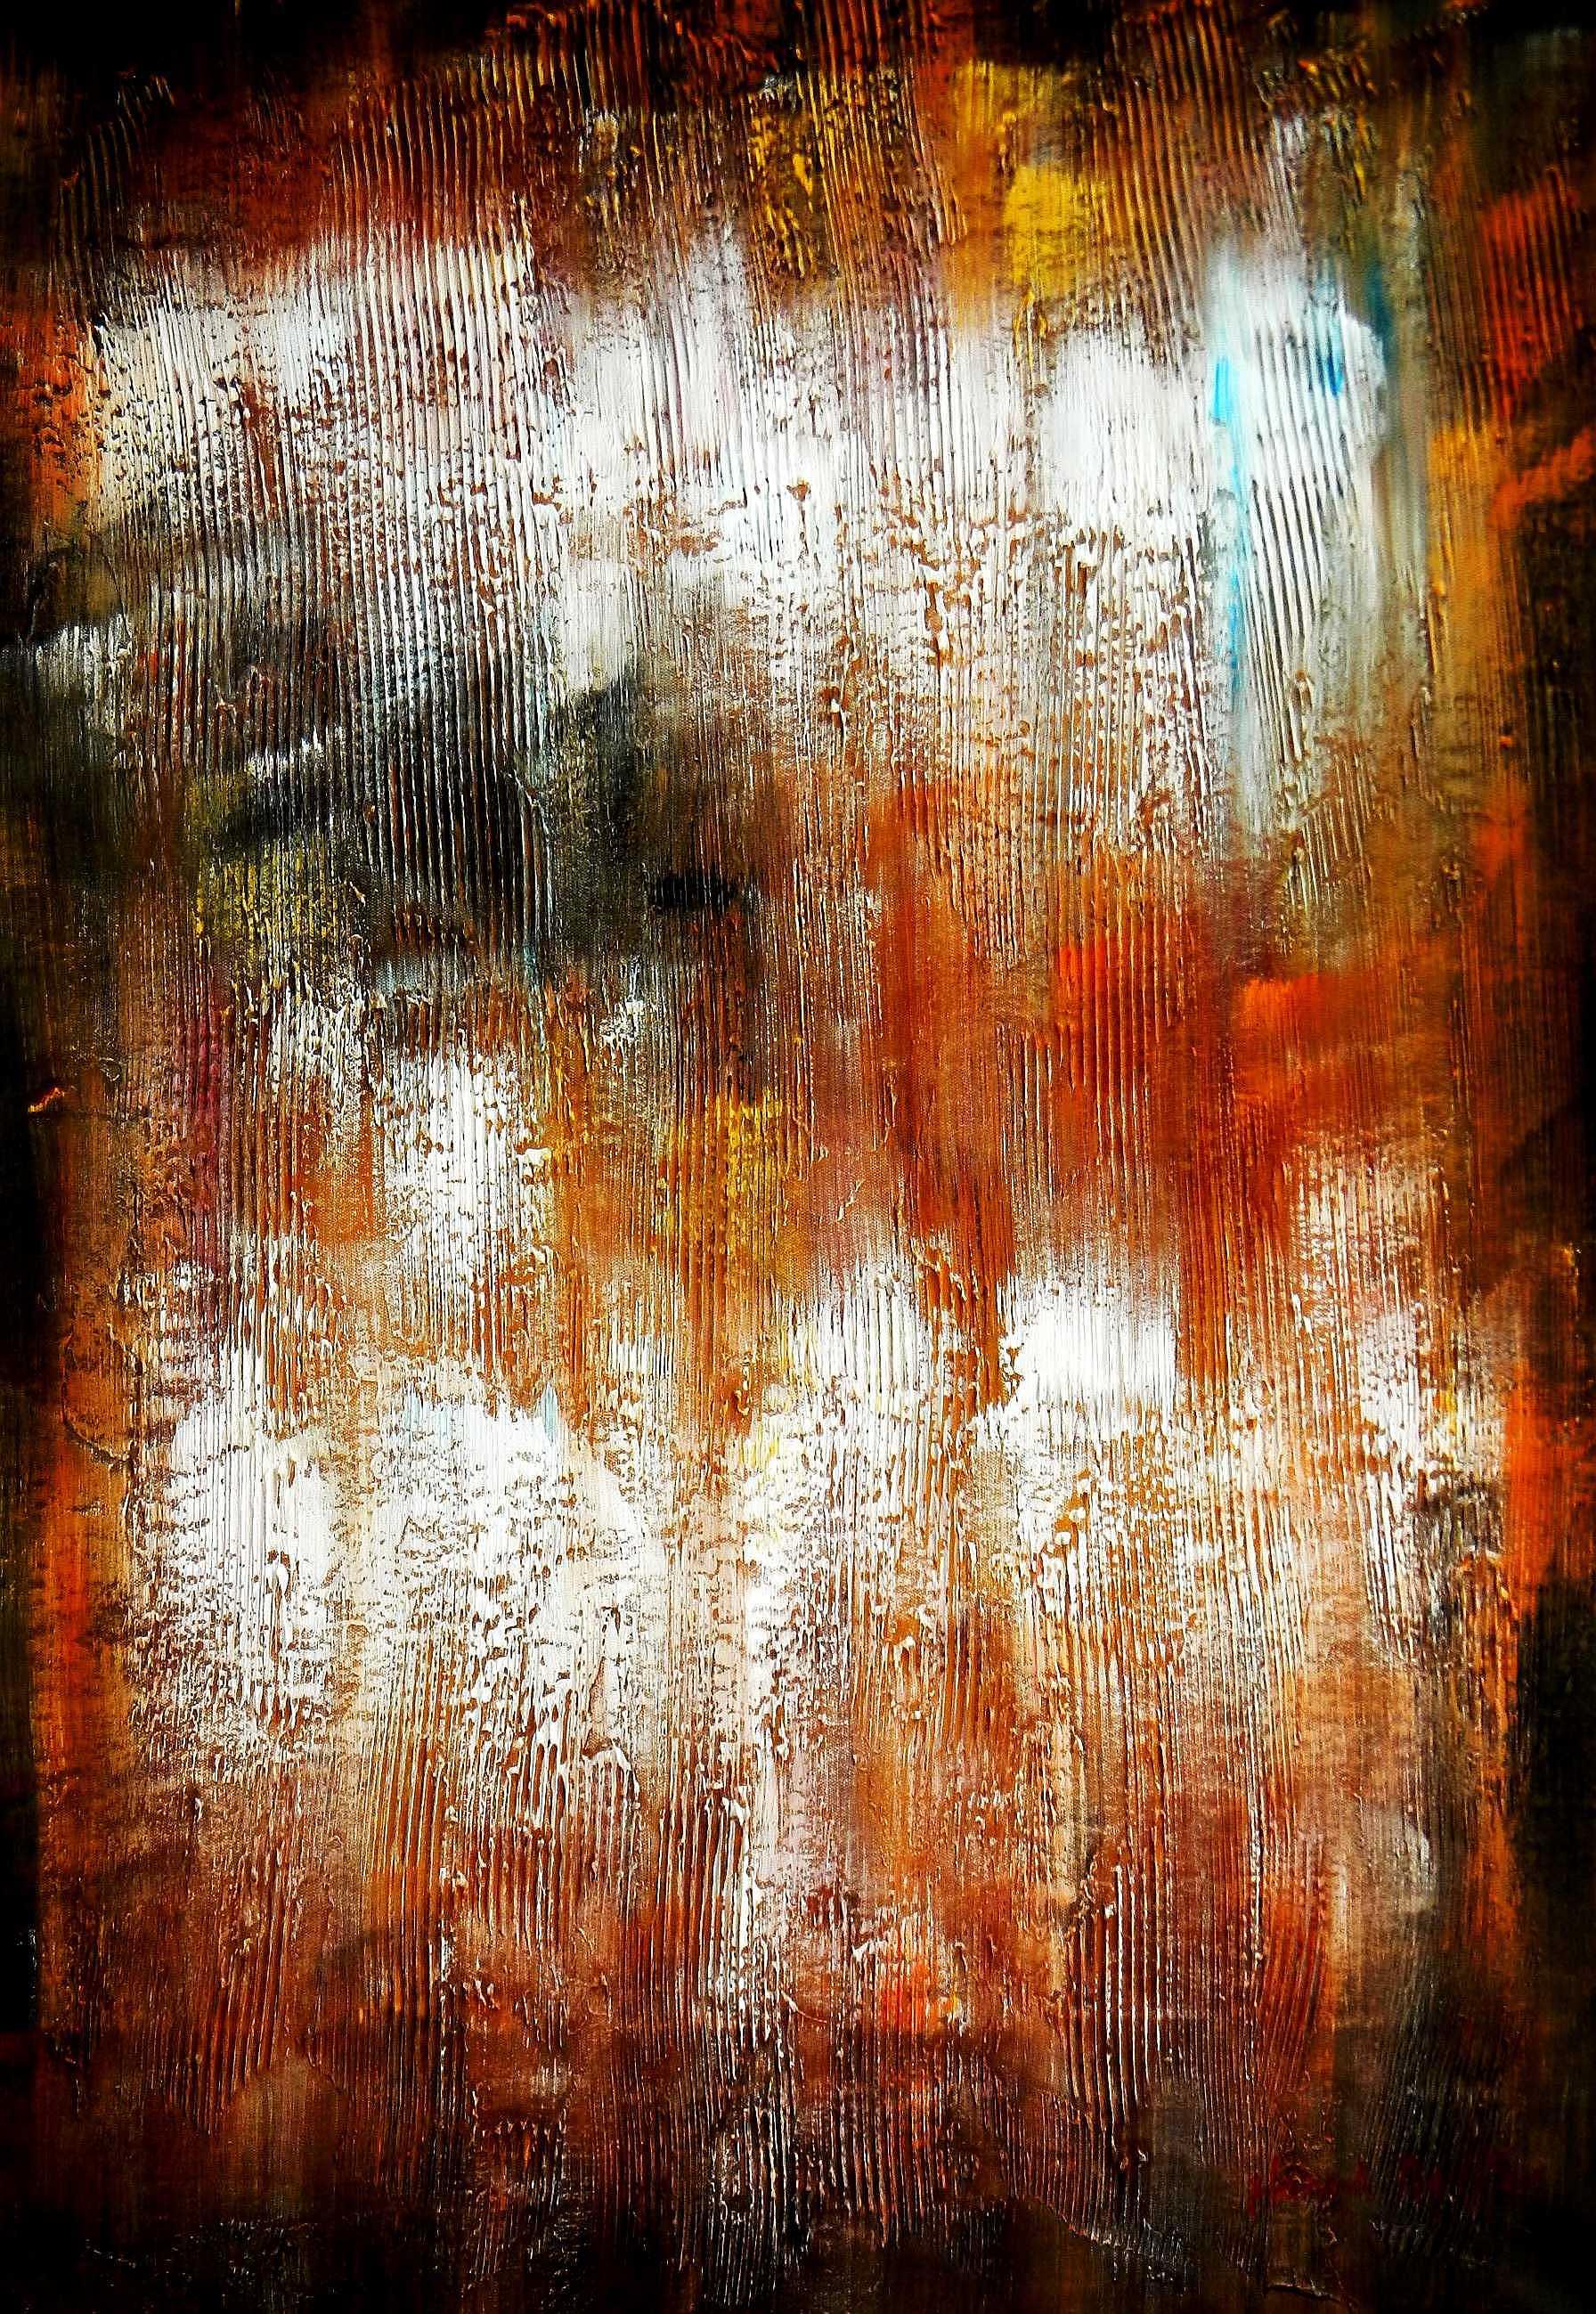 Abstrakt - Berlin am Lustgarten d94861 60x90cm Ölbild handgemalt